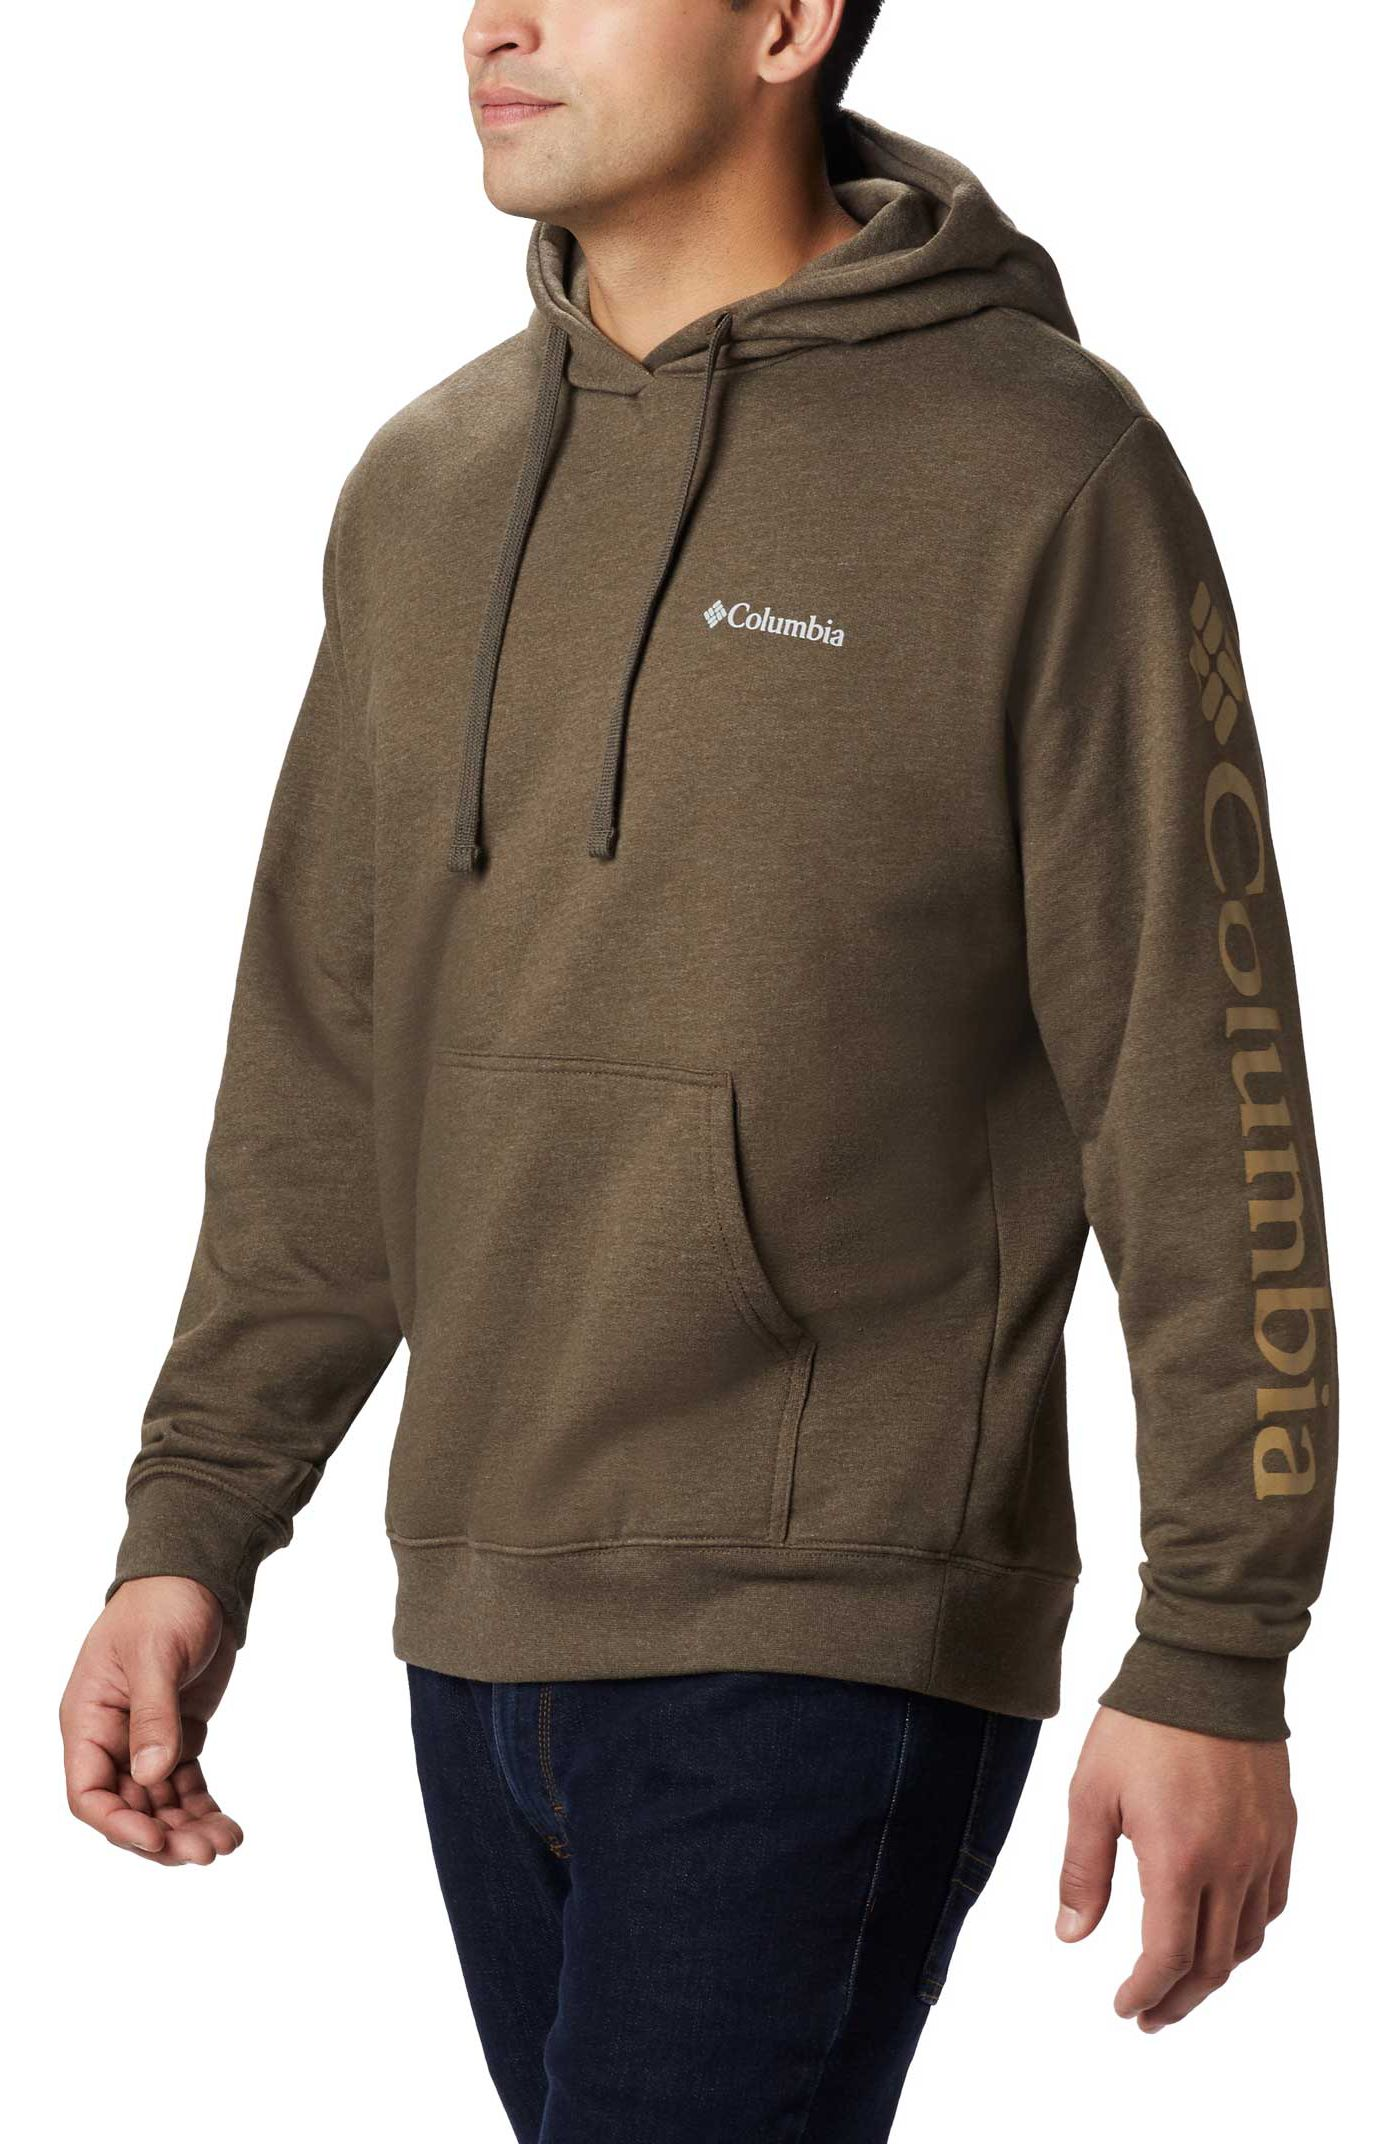 Columbia Men's Viewmont II Sleeve Graphic Hoodie